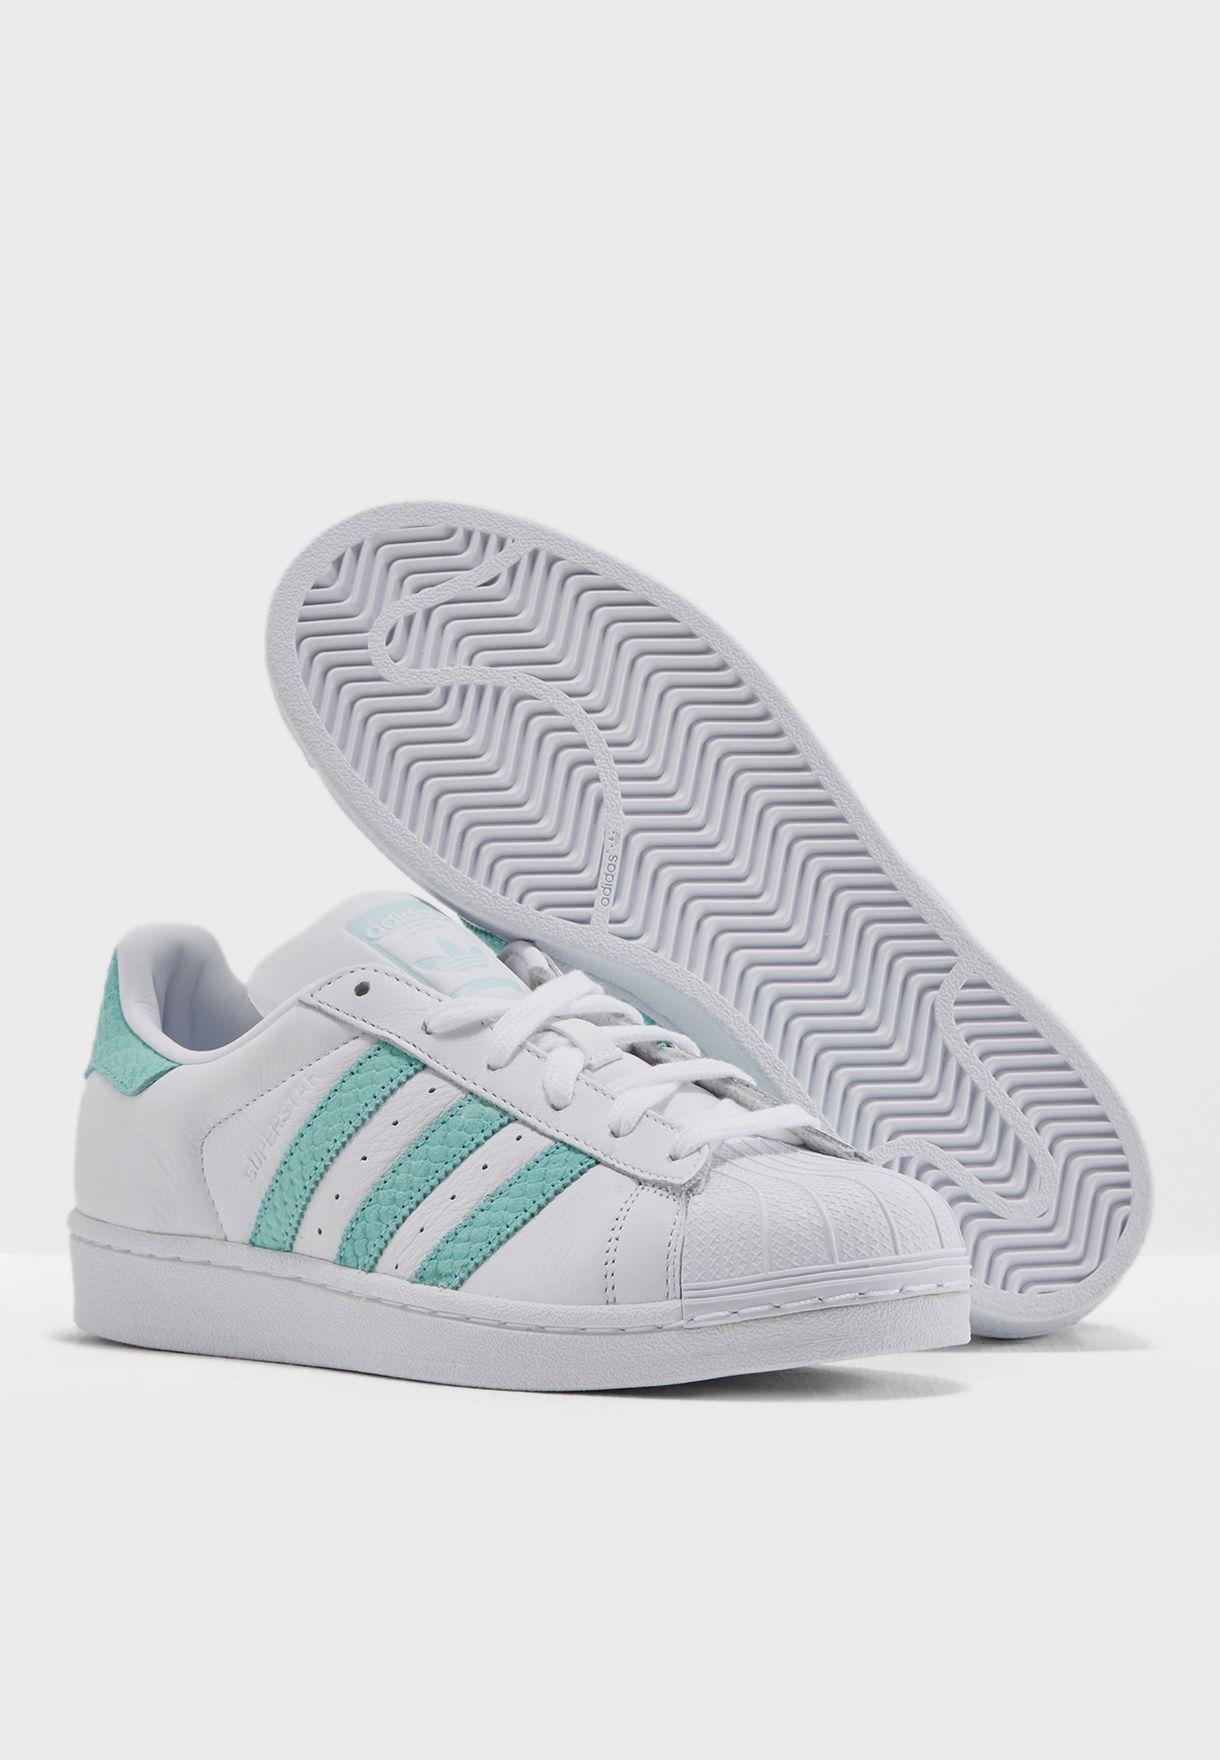 fb66a0bc0 تسوق حذاء سوبر ستار ماركة اديداس اورجينال لون أبيض CG5461 في ...